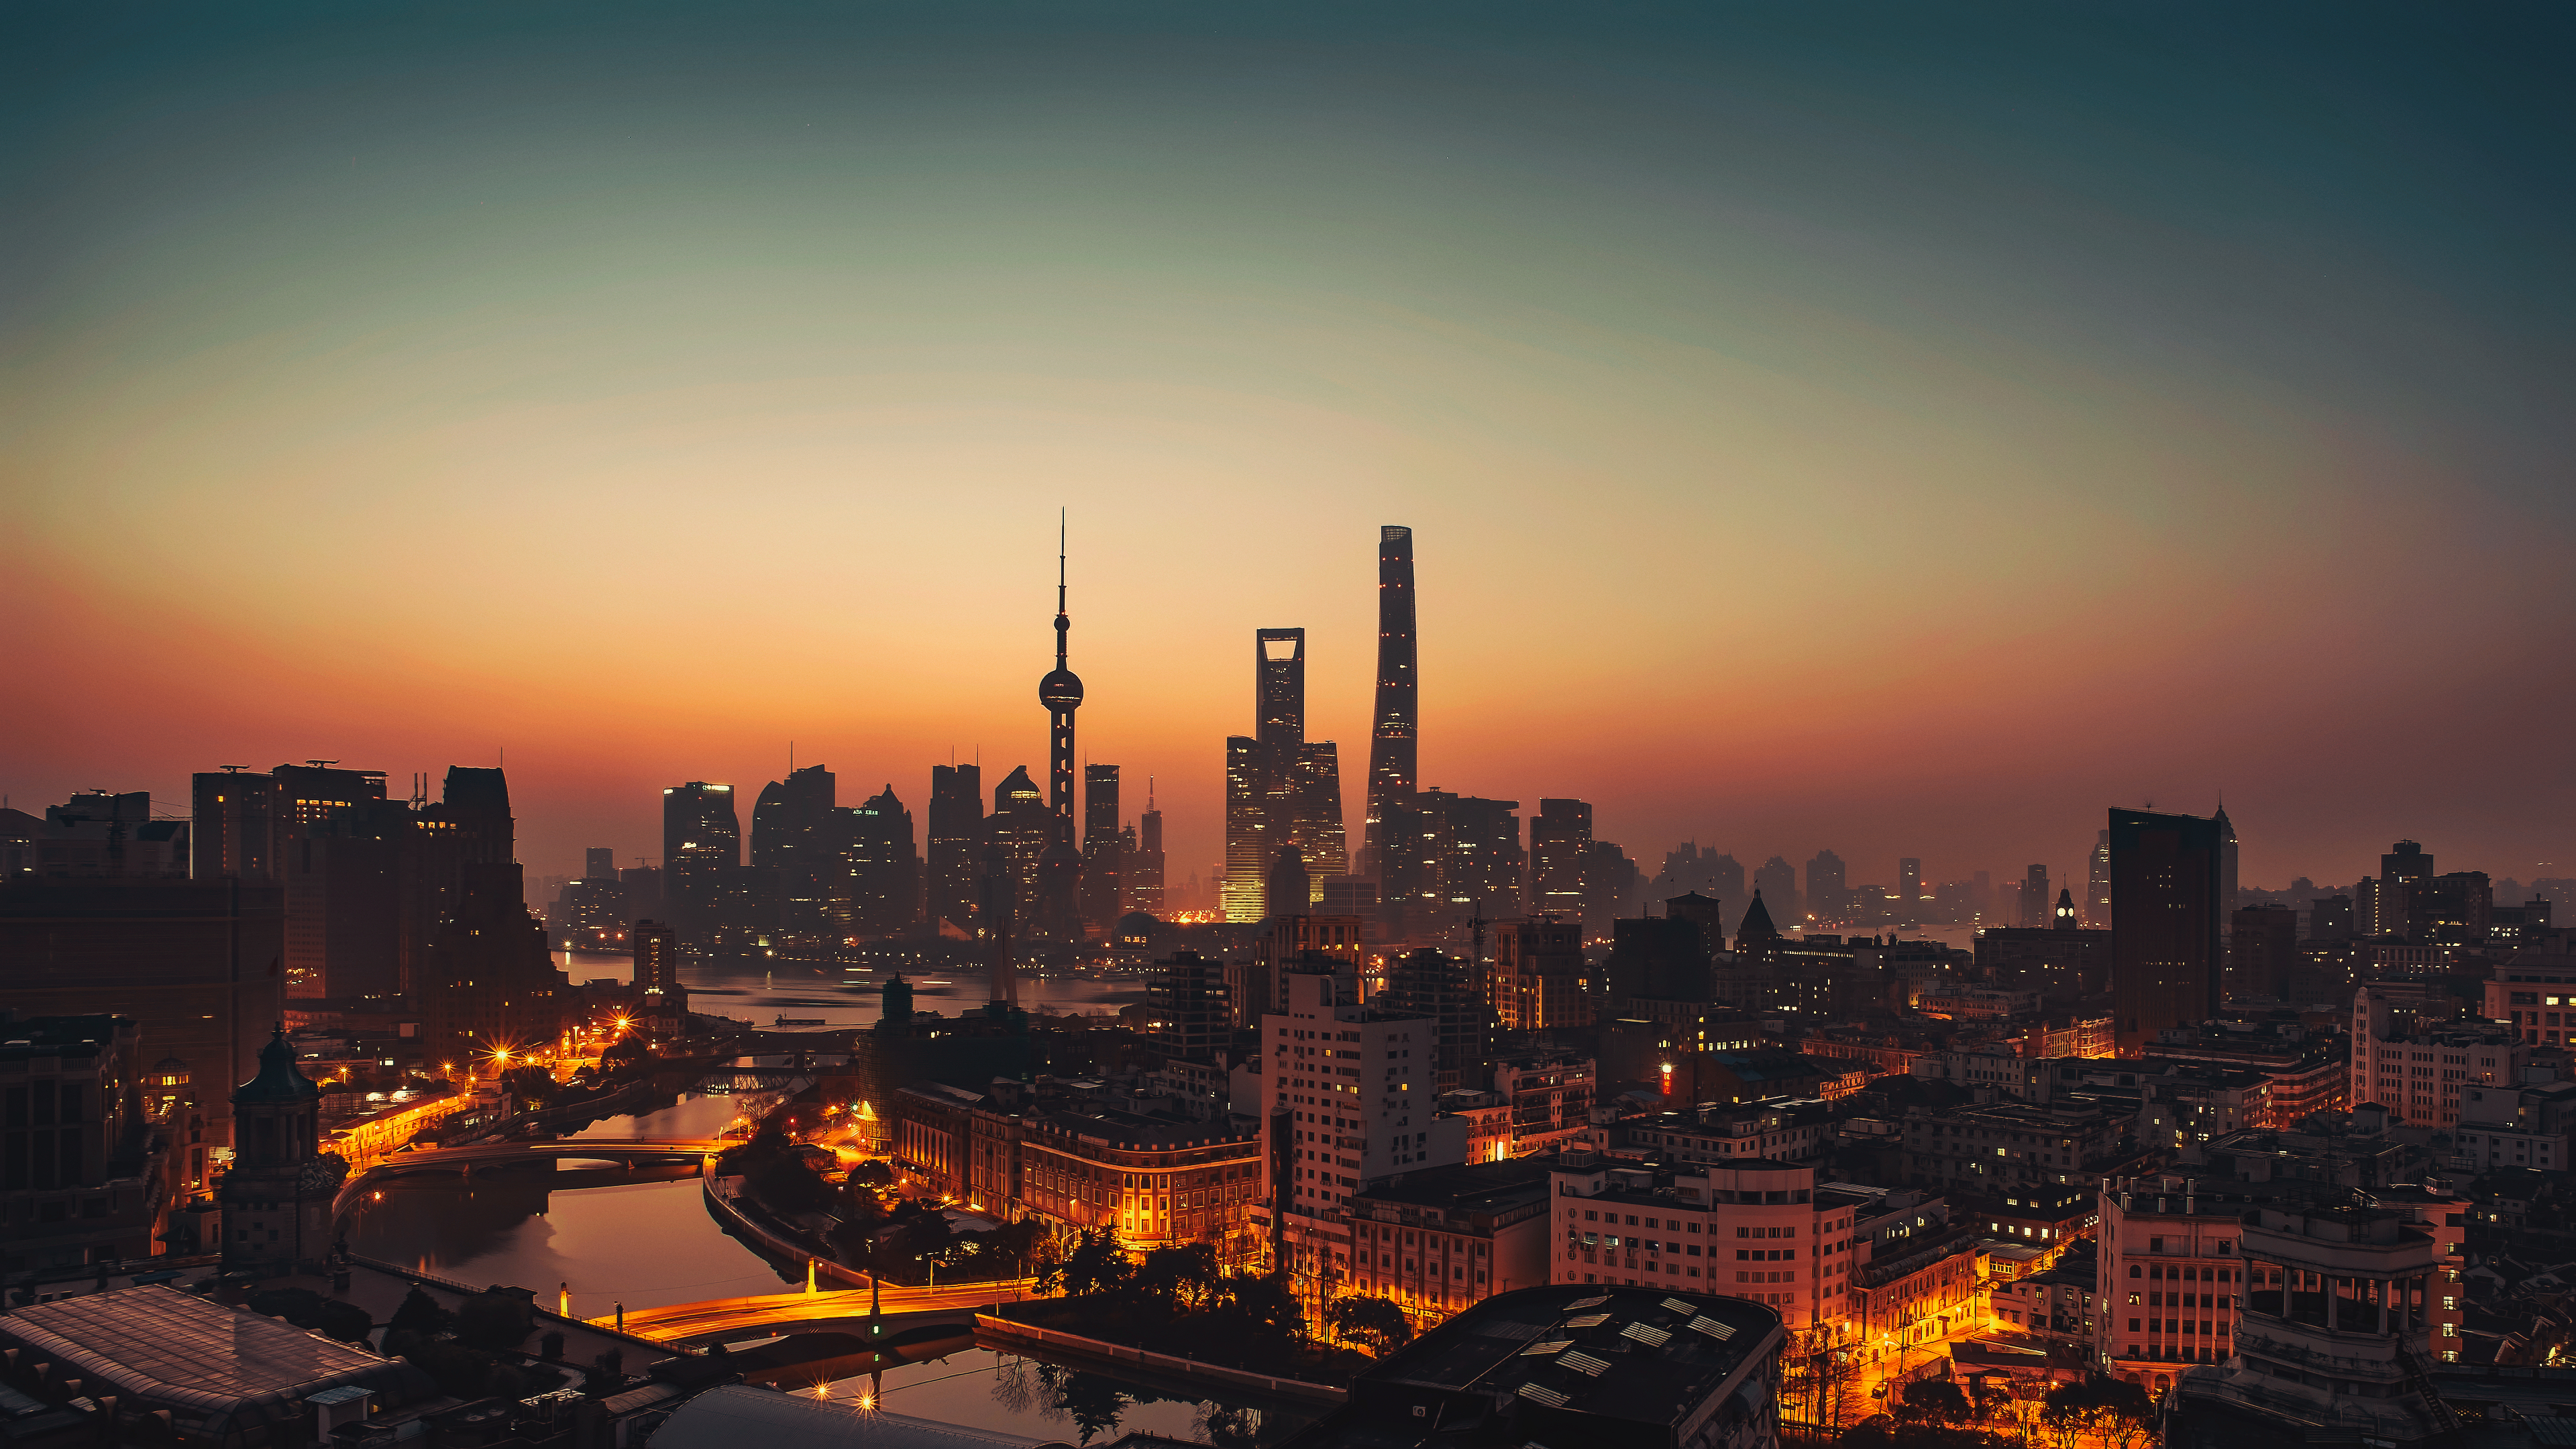 General 3840x2160 cityscape city sunlight sunset photography architecture Shanghai orange sky skyscraper city lights